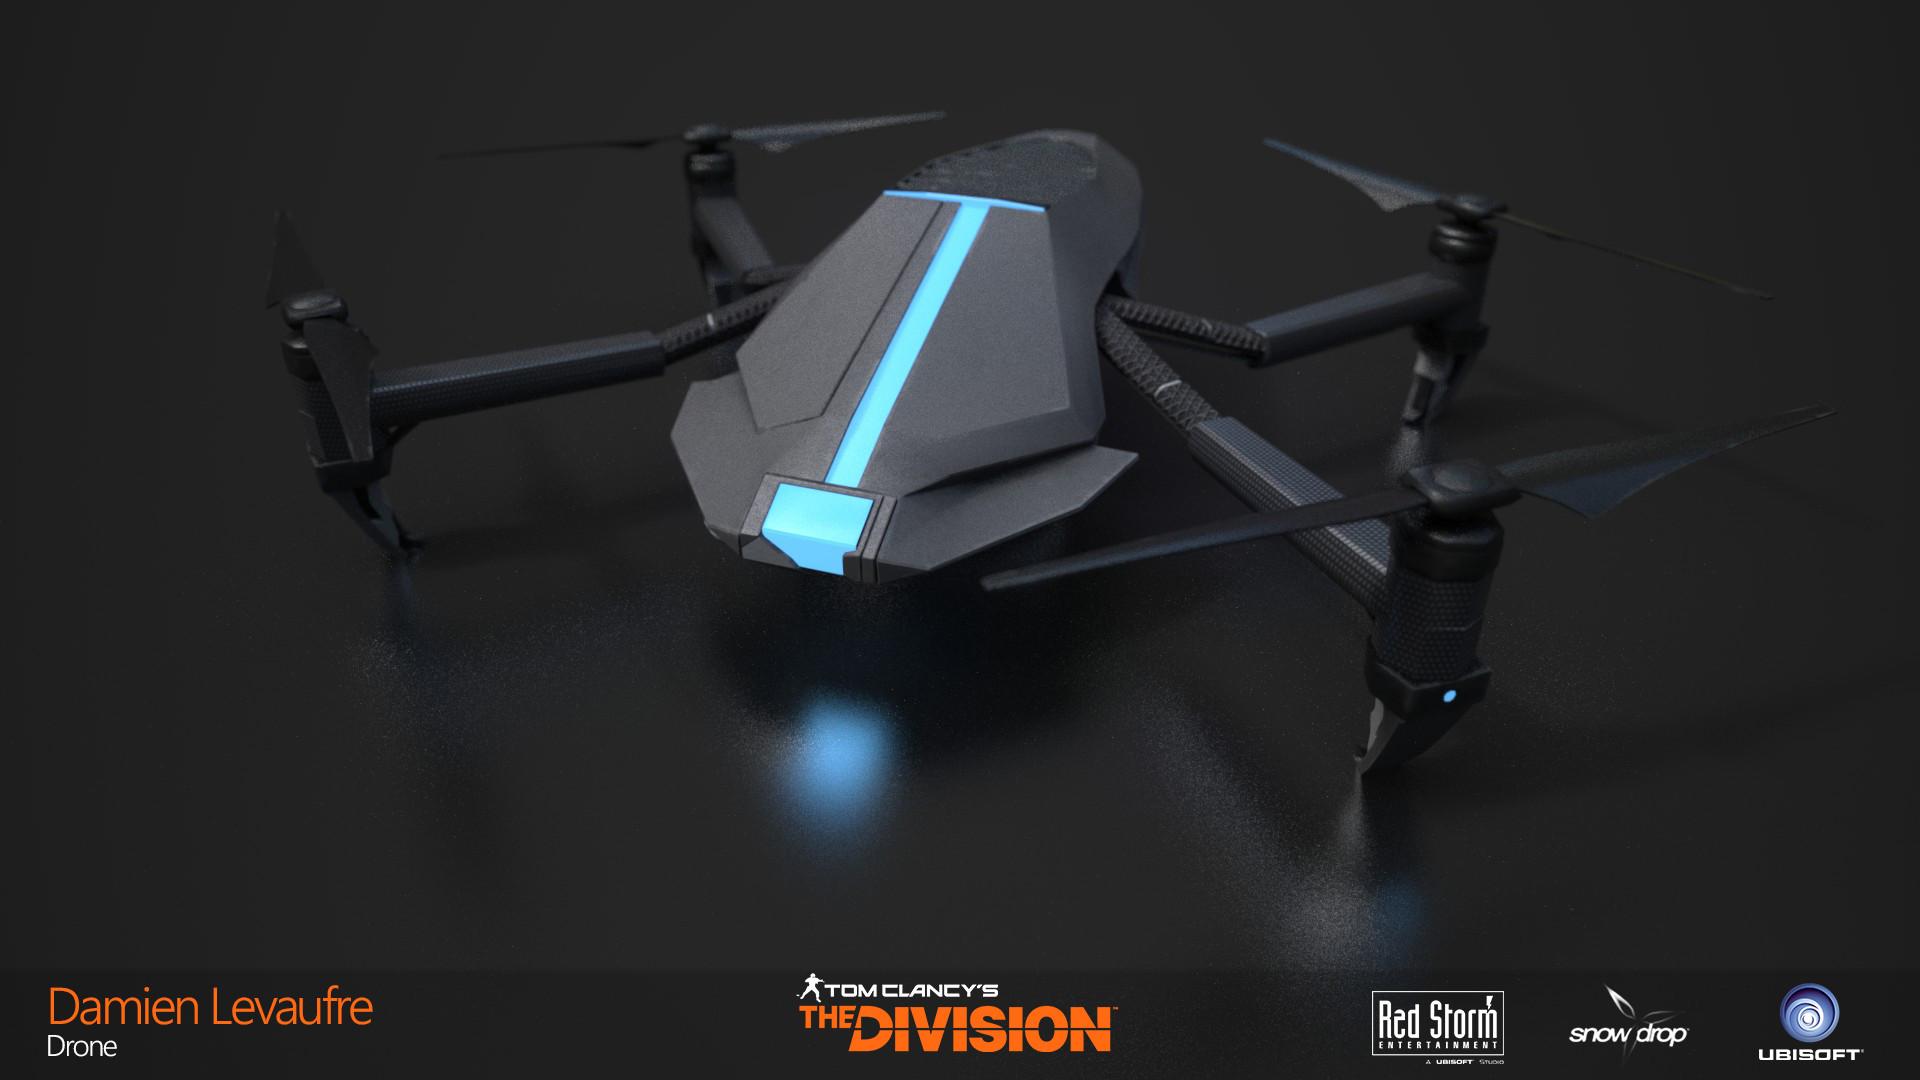 Damien levaufre drone 3 4